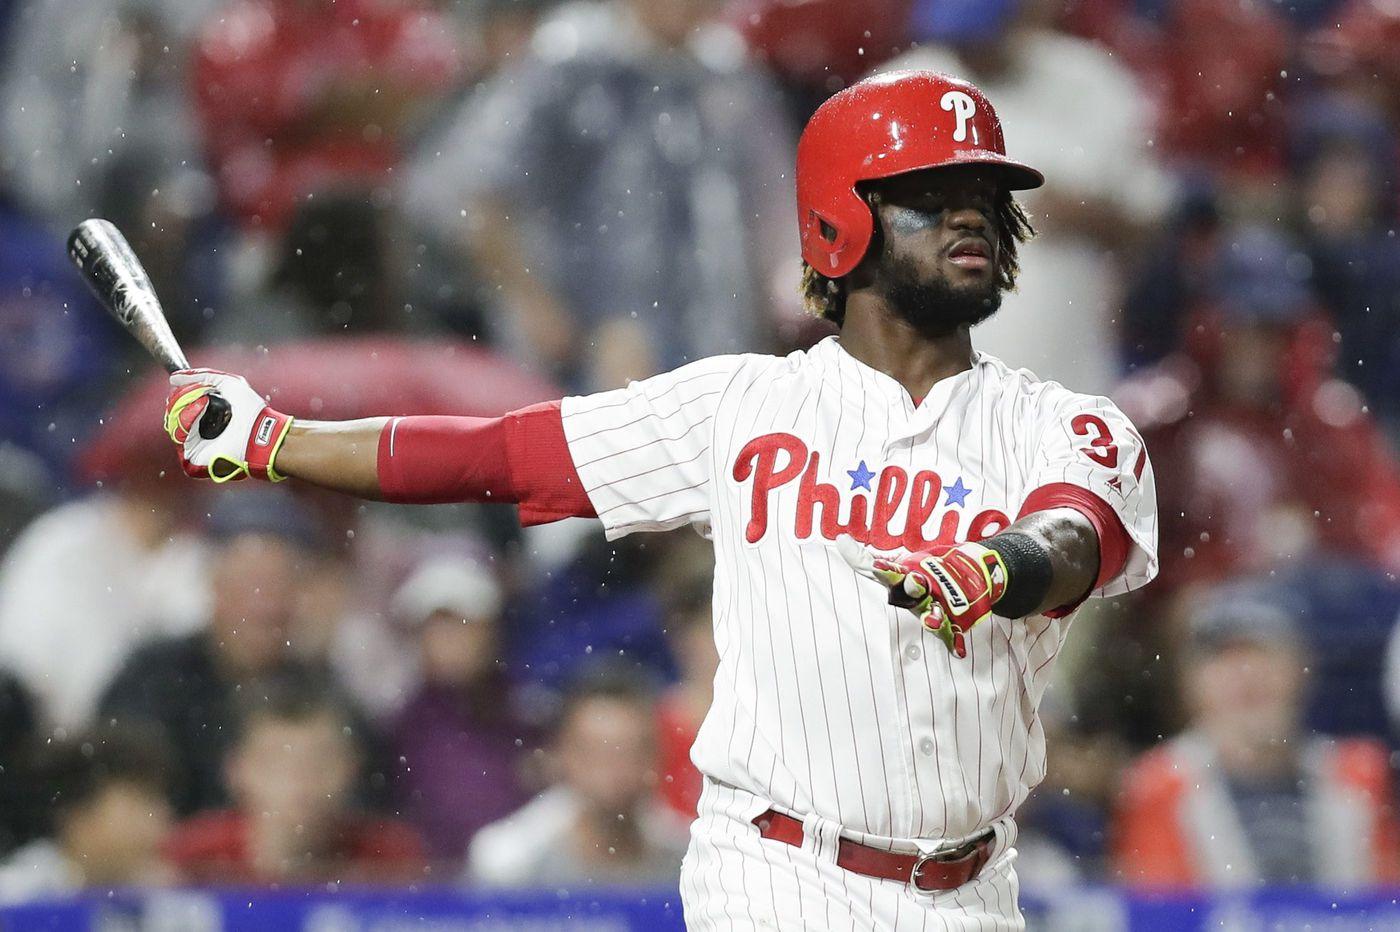 As a season wanes, a complex set of decisions awaits the Phillies | David Murphy